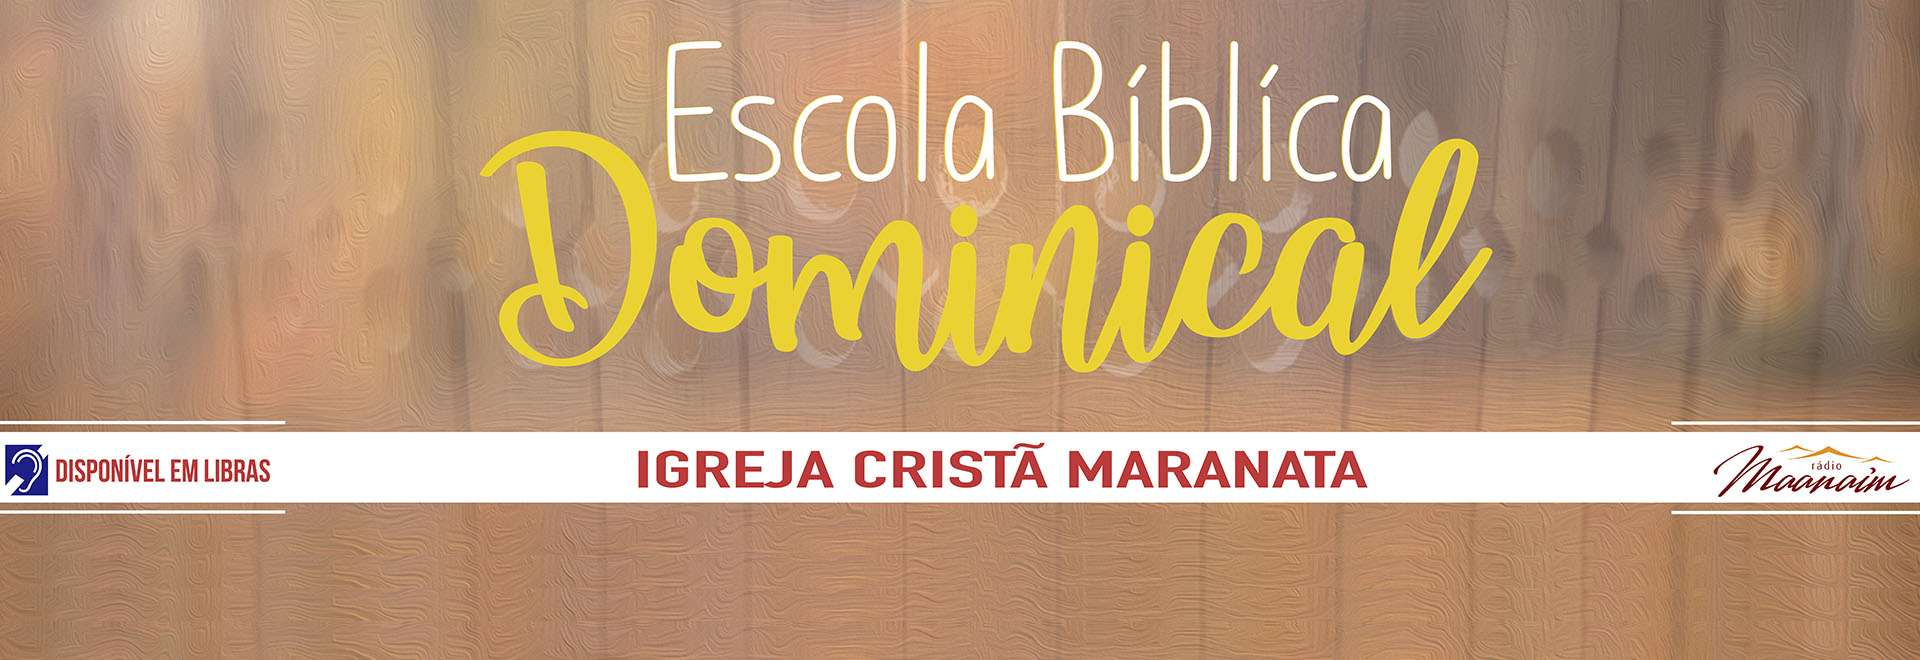 Participações da EBD da Igreja Cristã Maranata - 06/09/2020